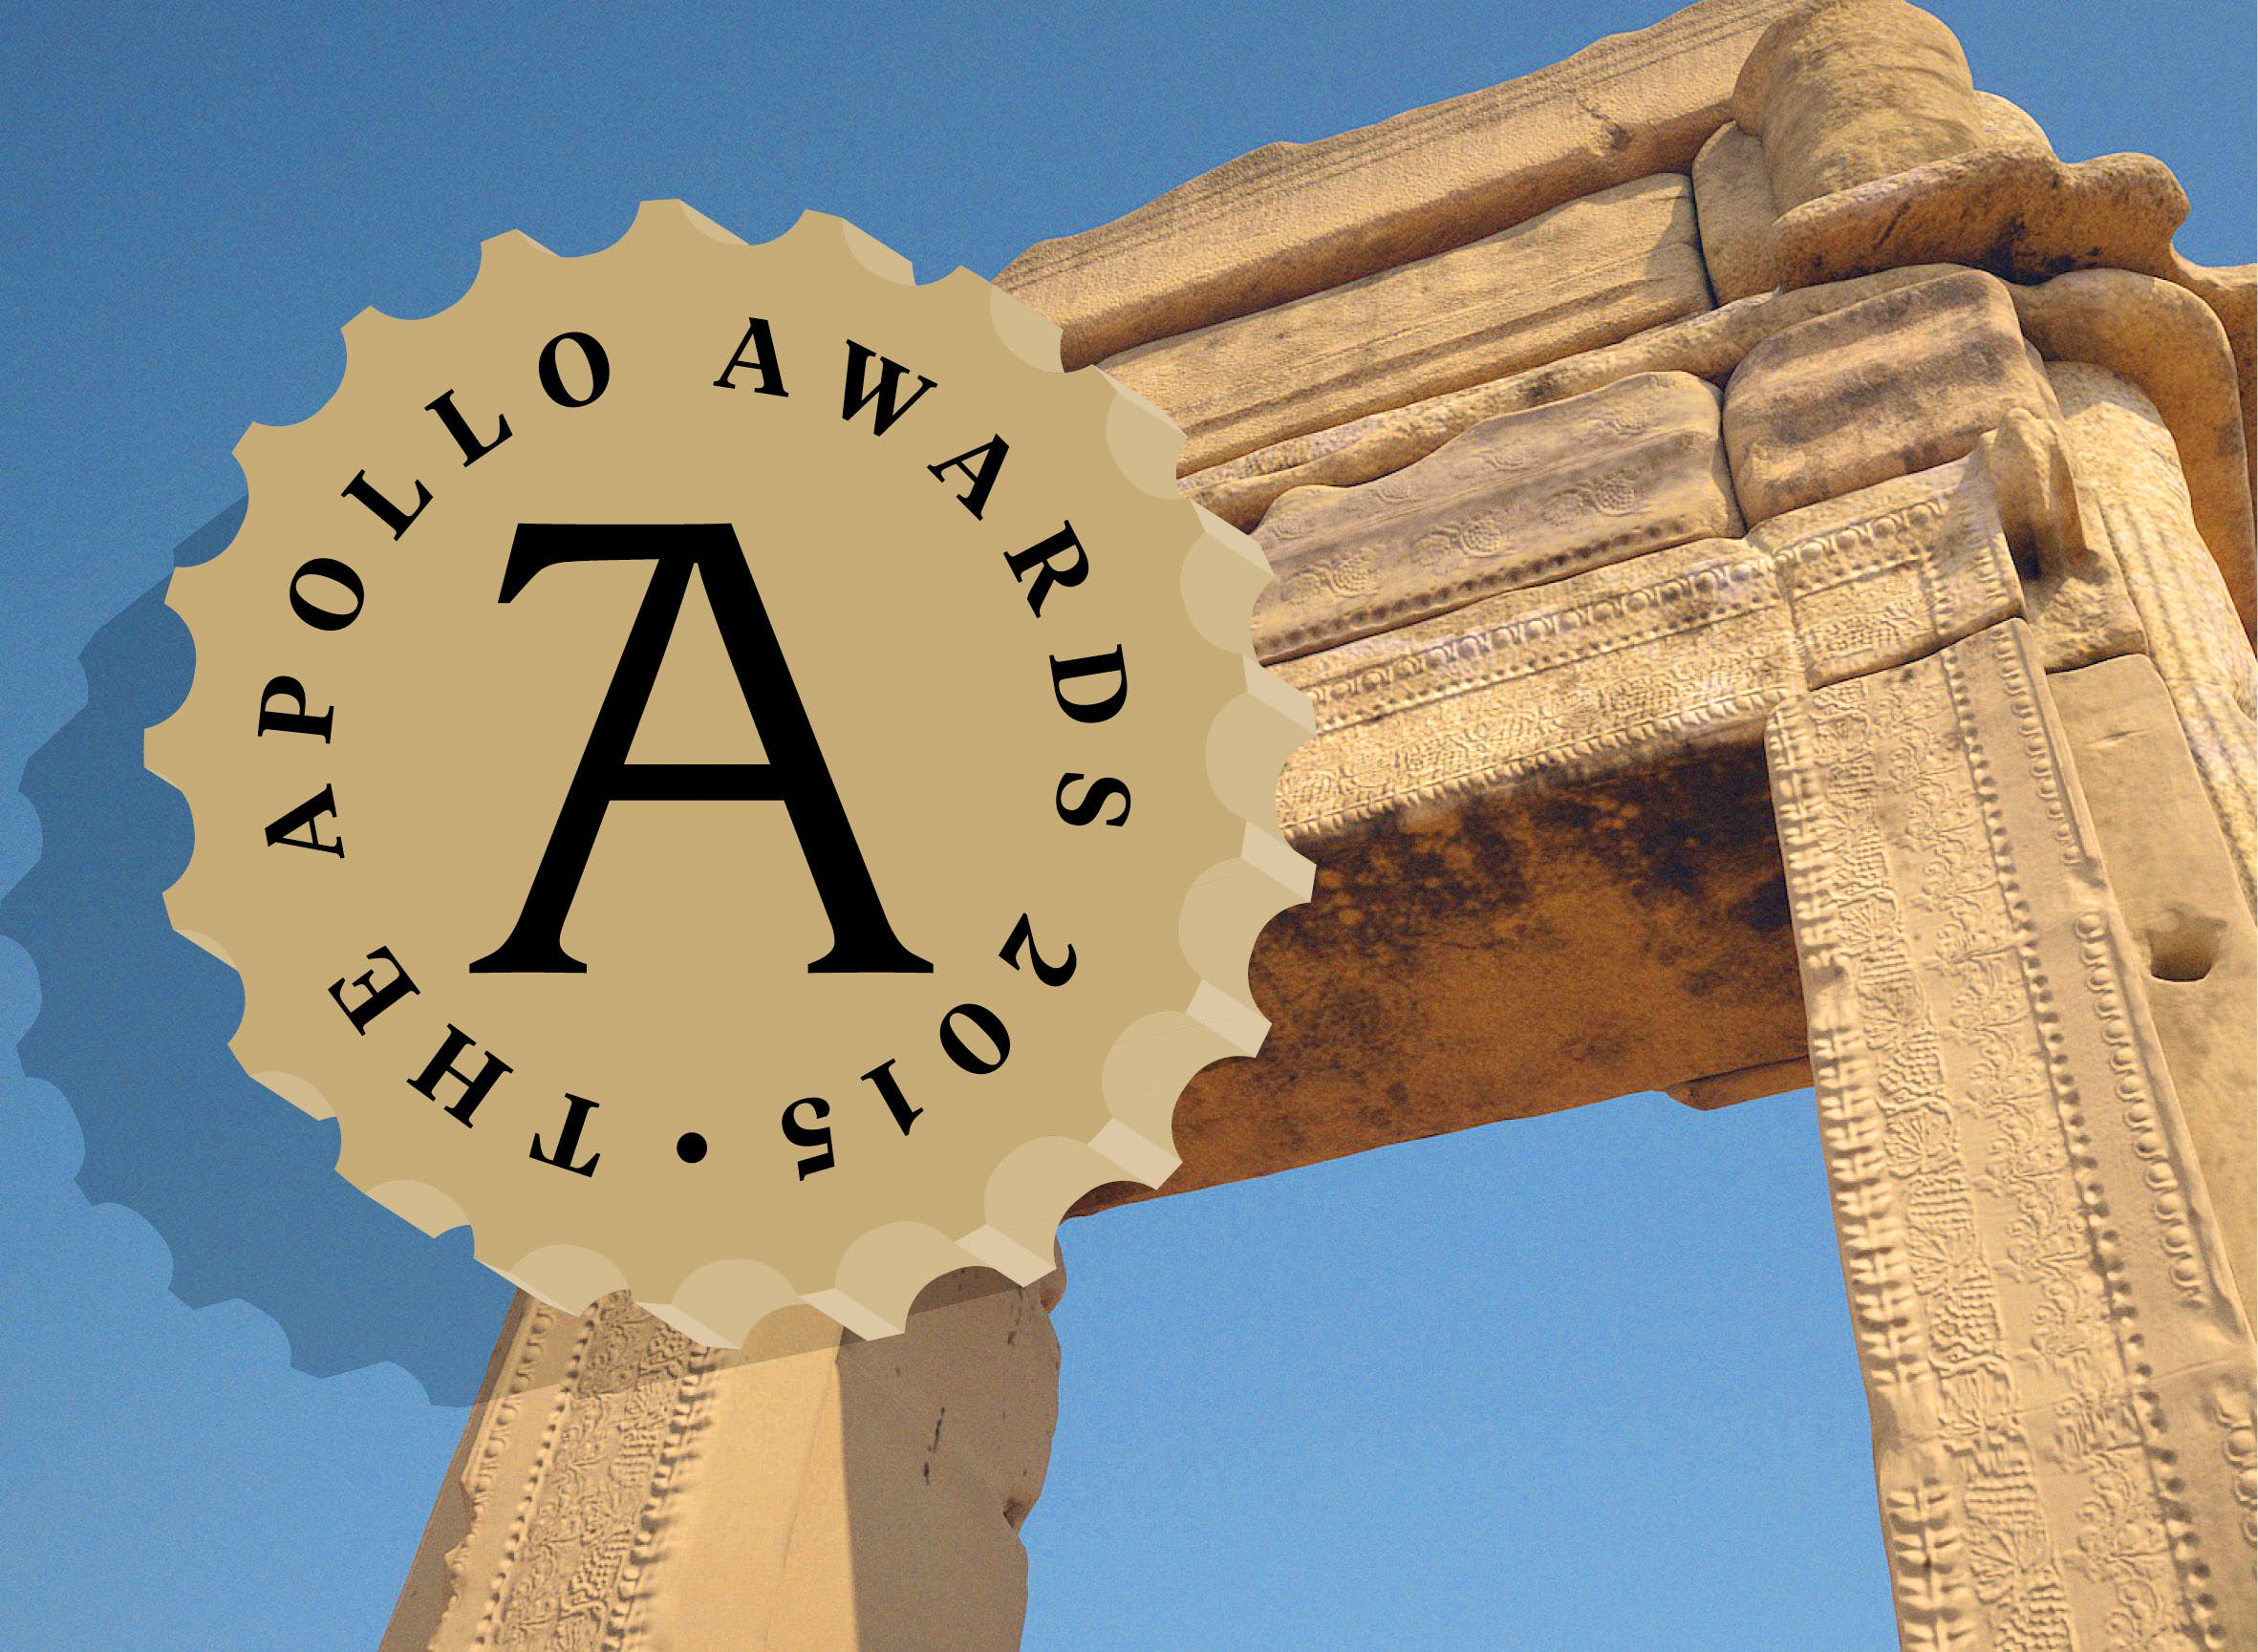 Apollo Awards: Digital Innovation of the Year: Million Image Database